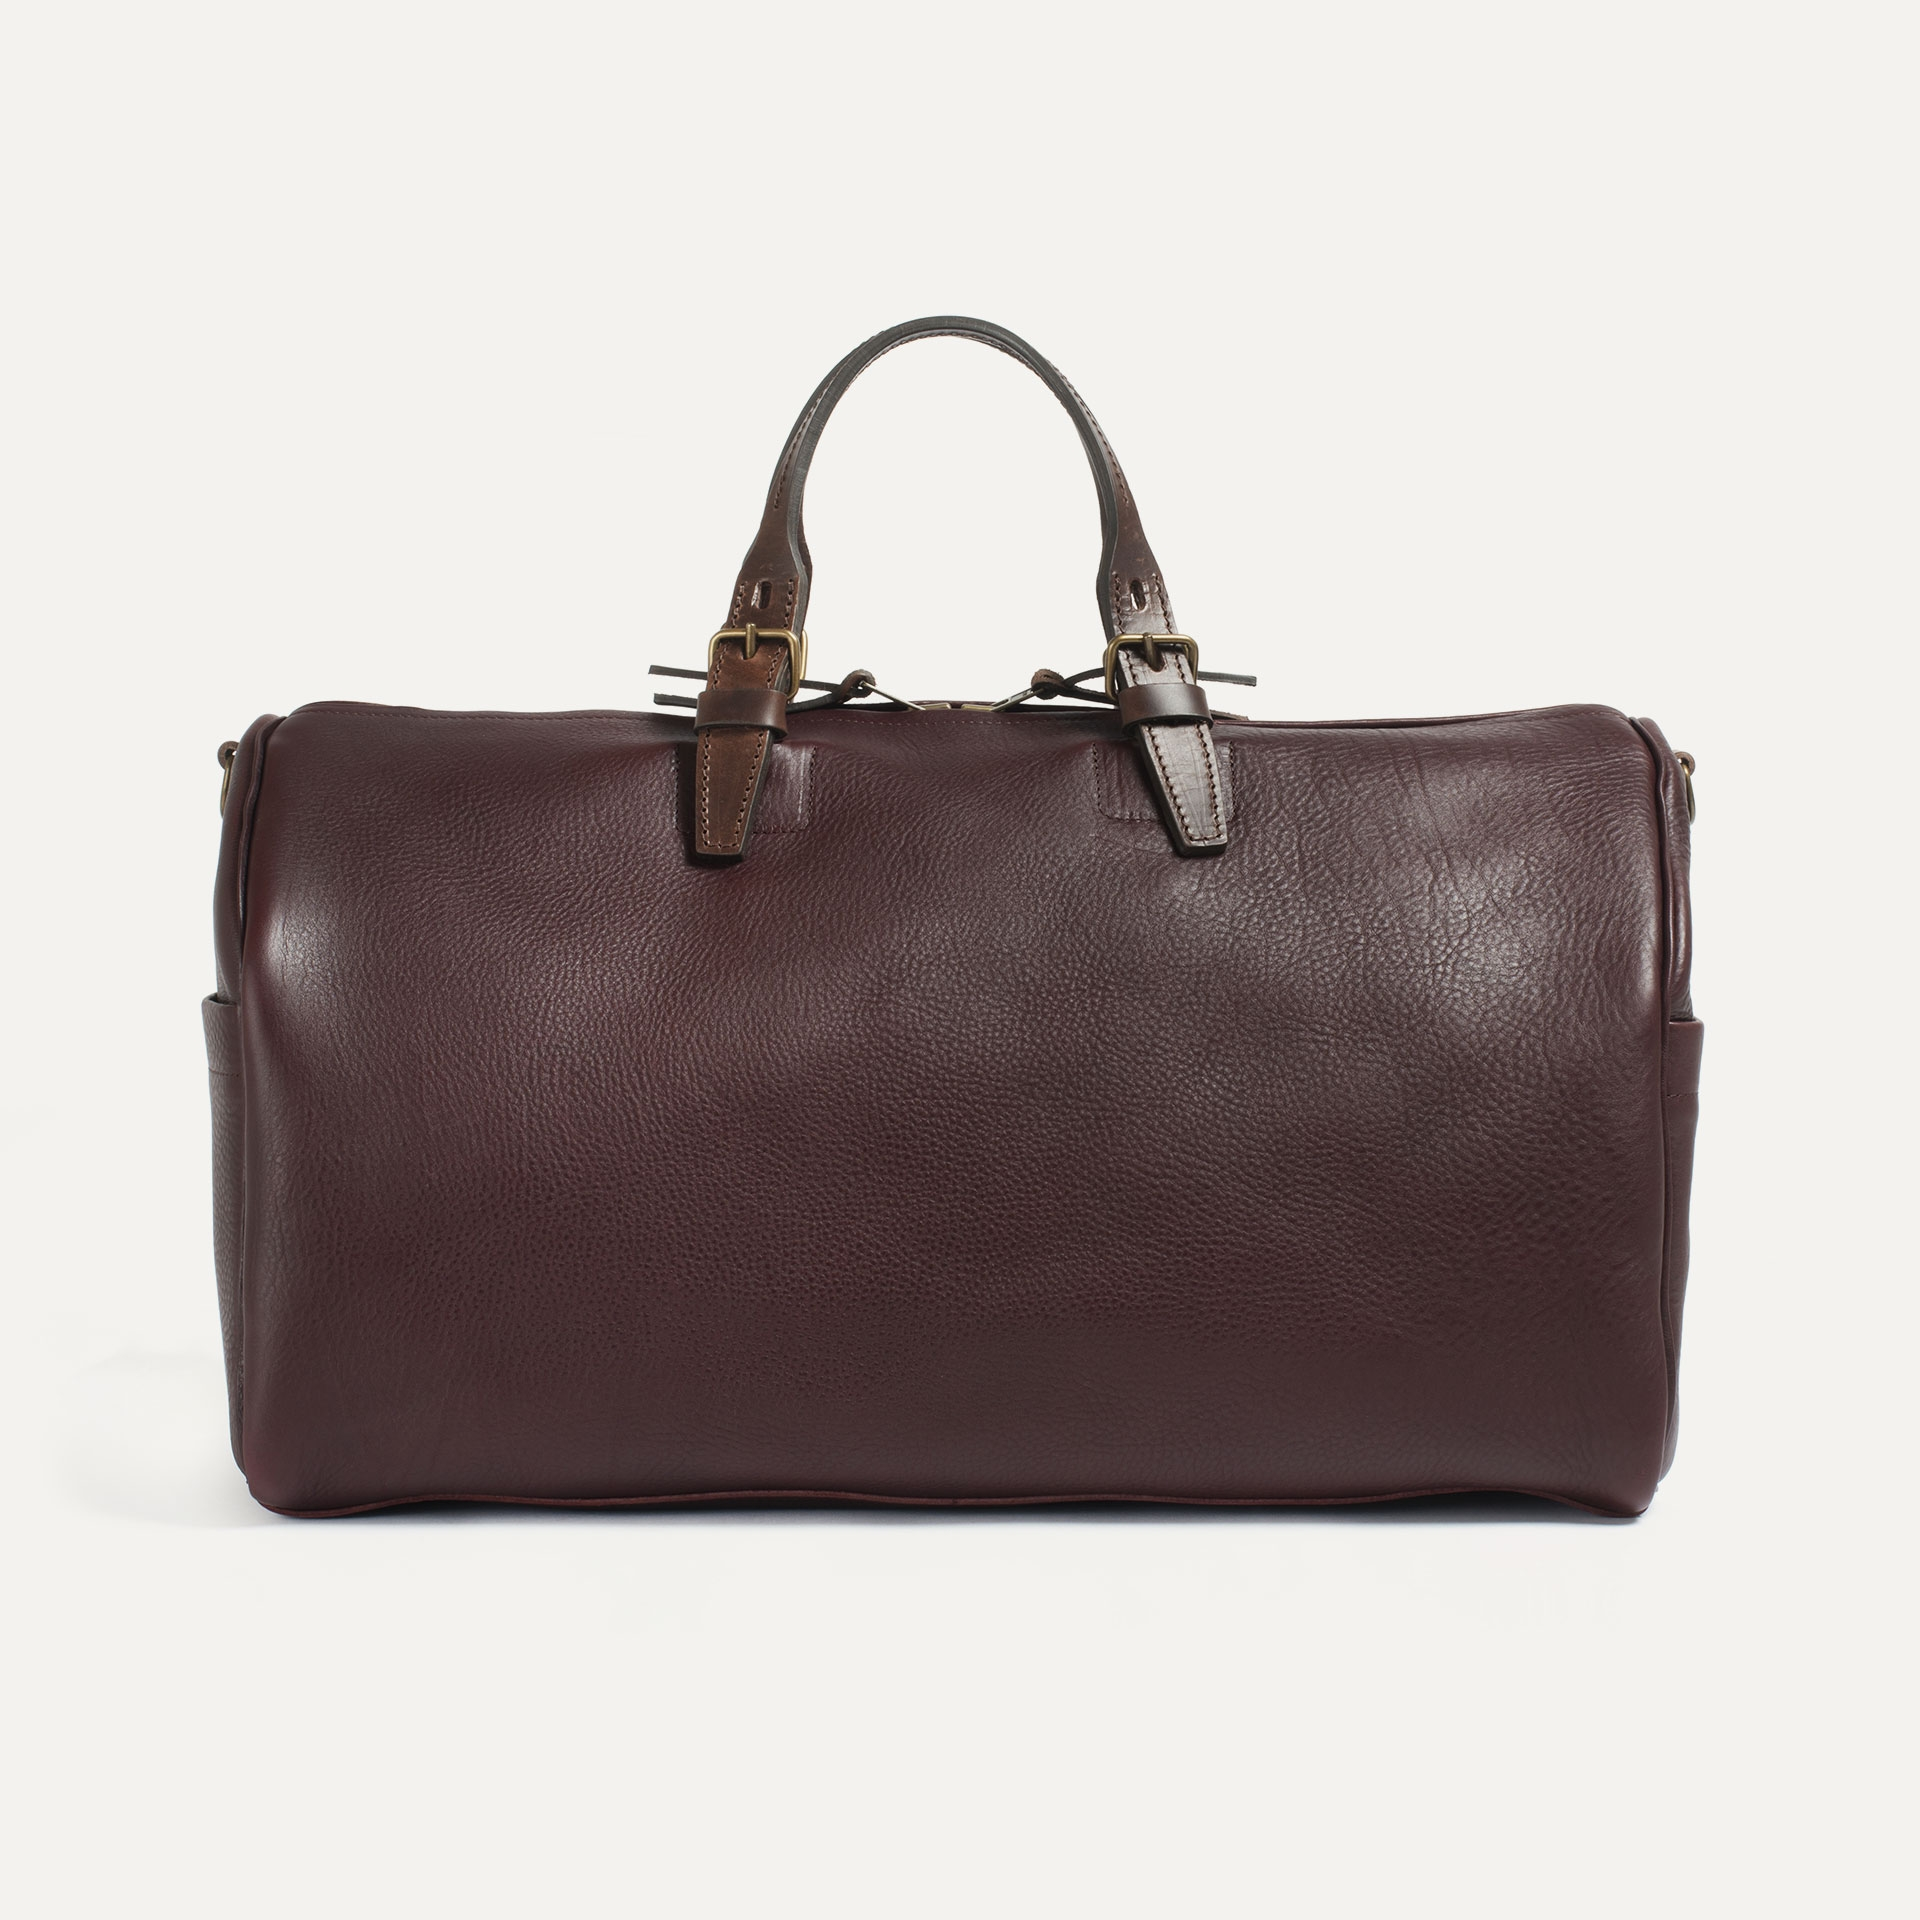 Hobo Travel bag - Peat (image n°3)